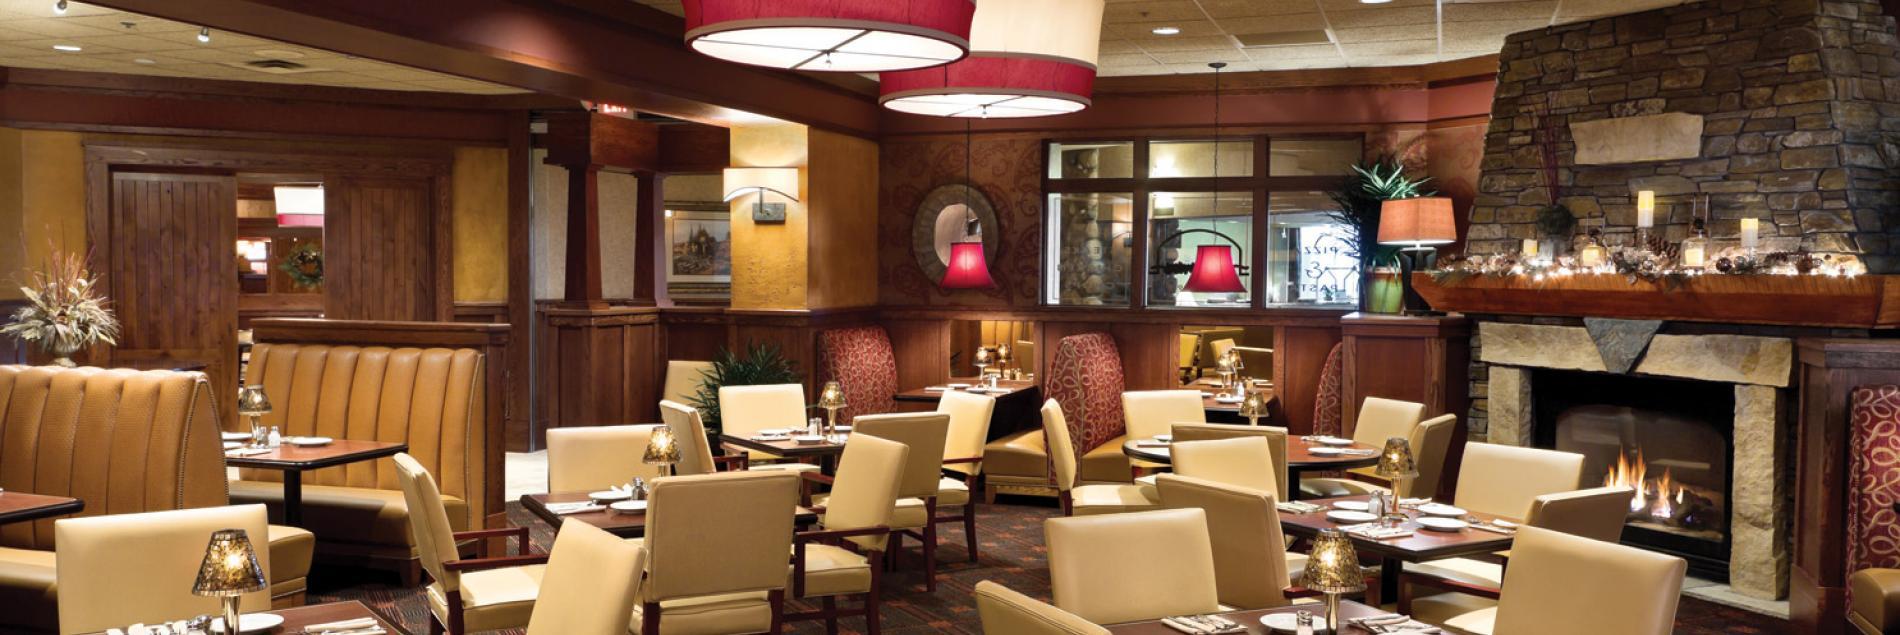 Minerva's Restaurant & Bar